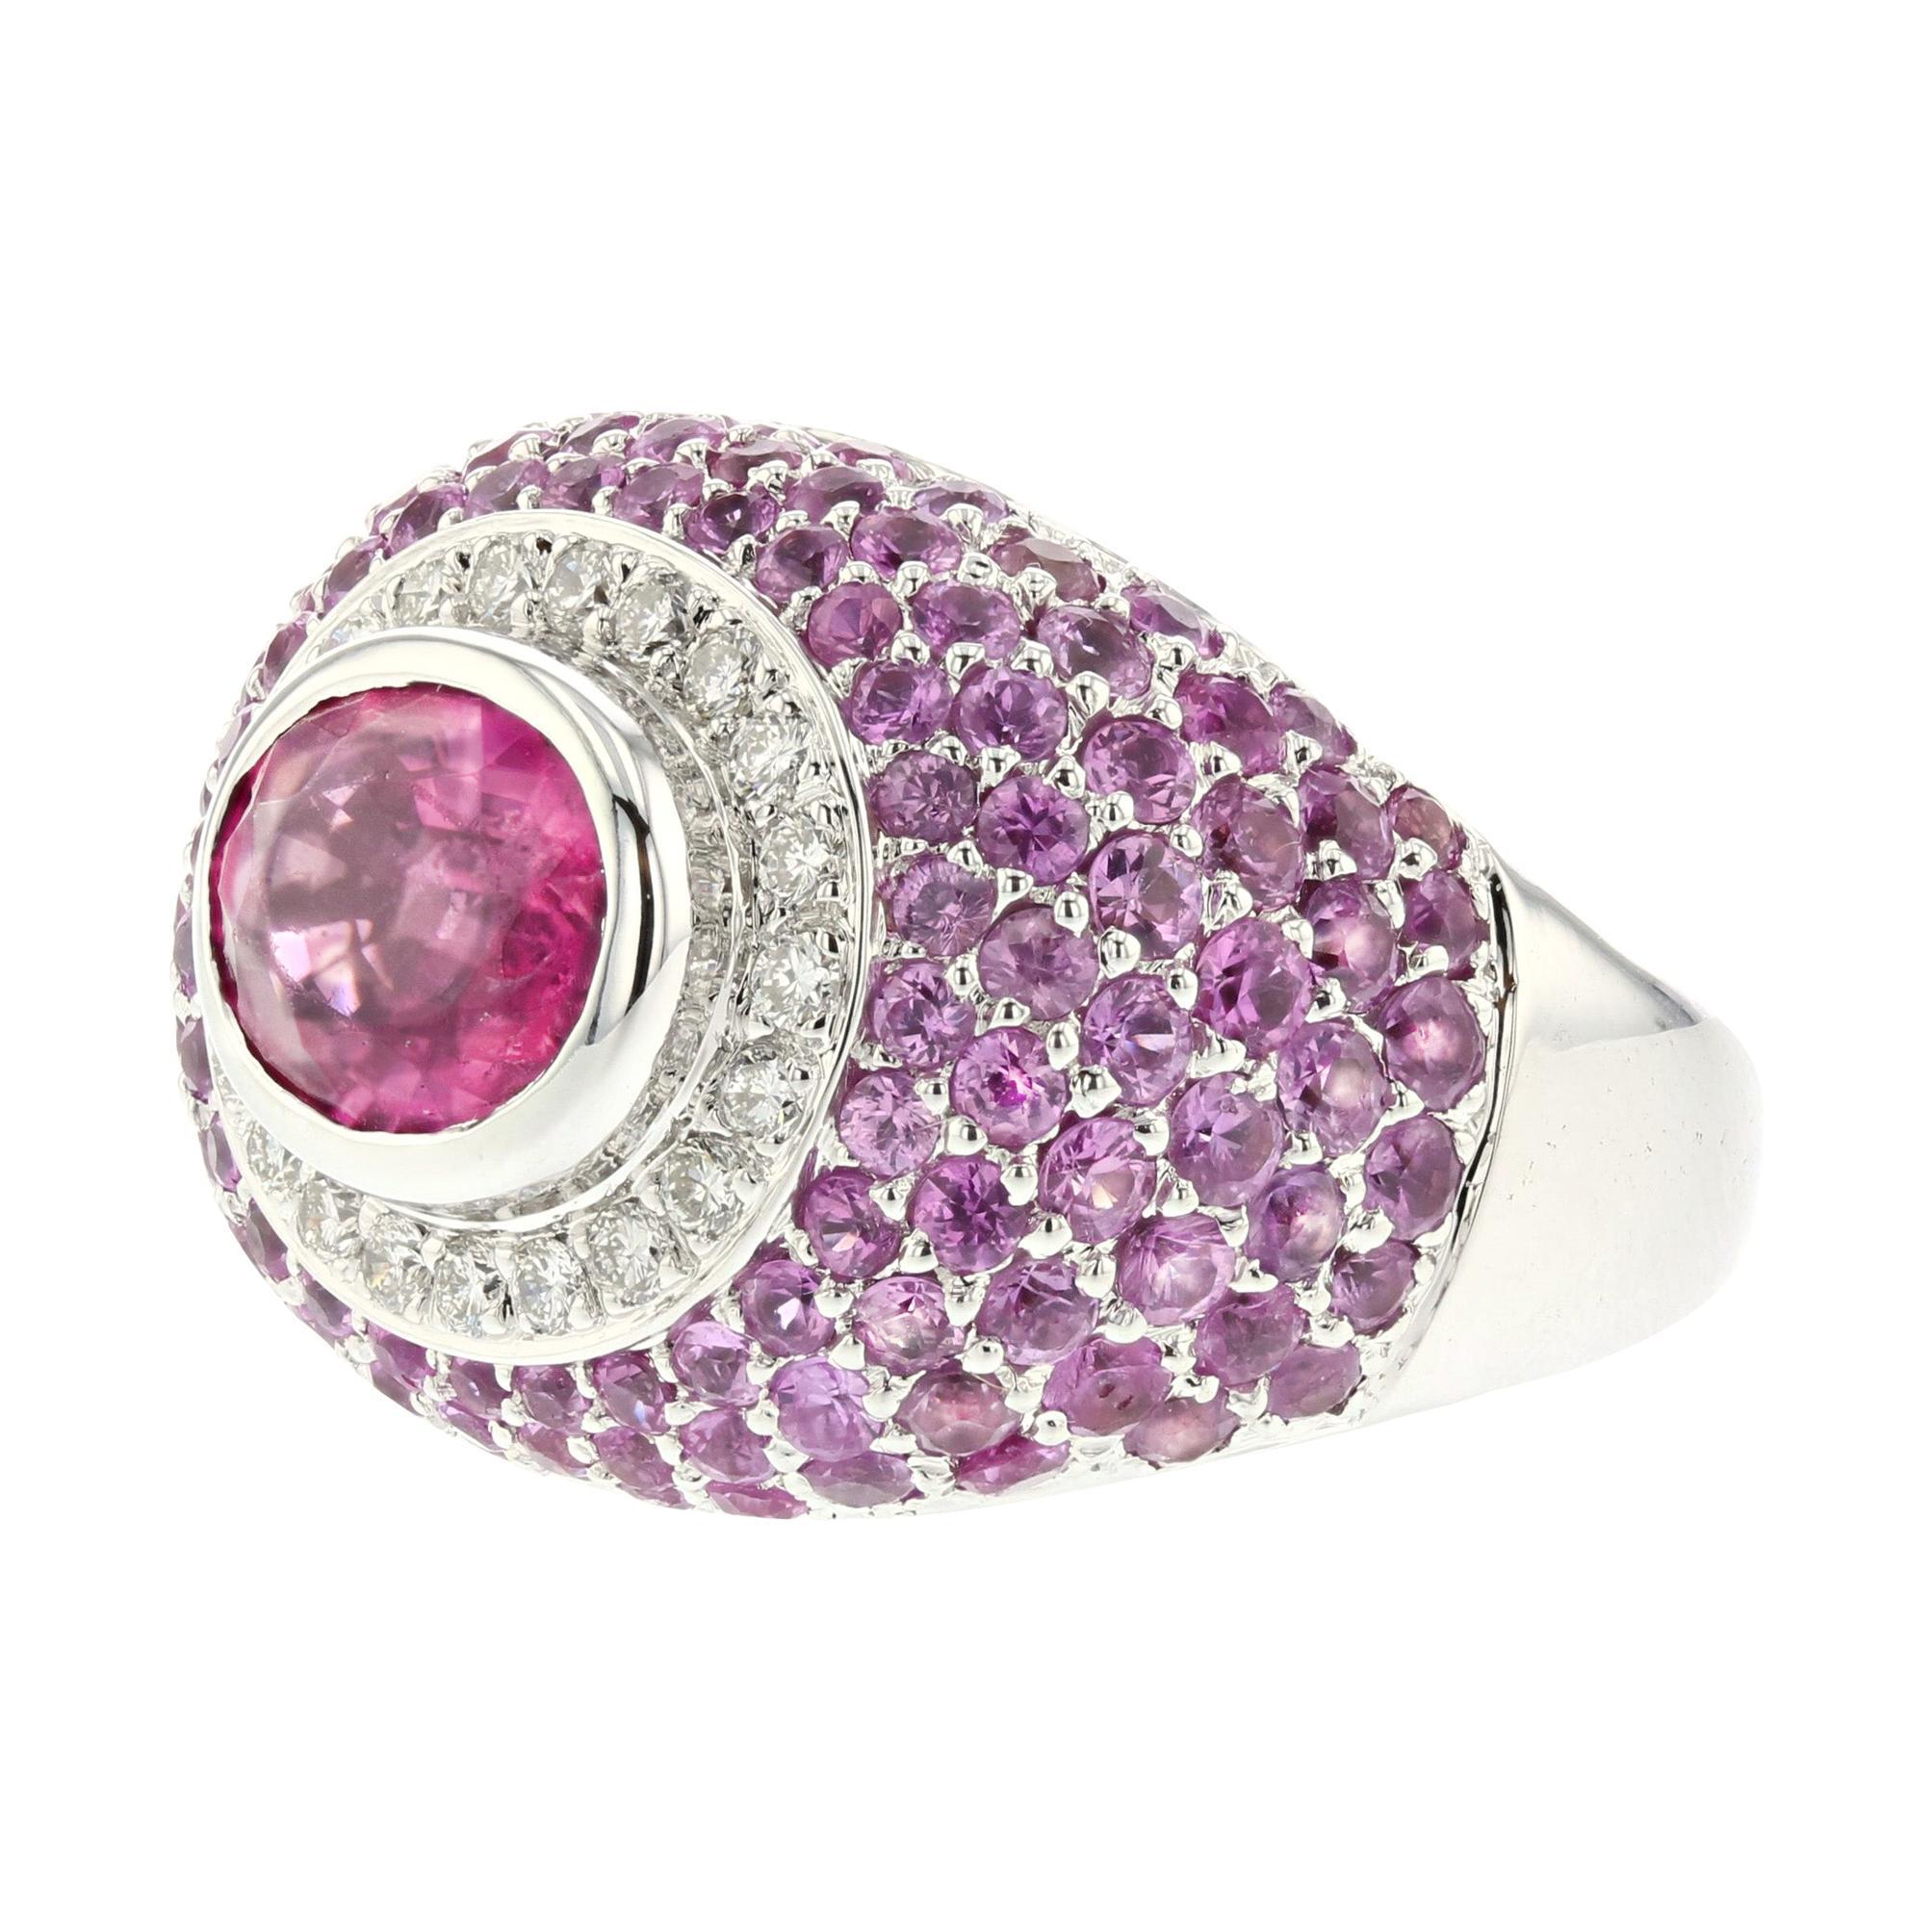 18K White Gold Pink Tourmaline Ring with Diamonds